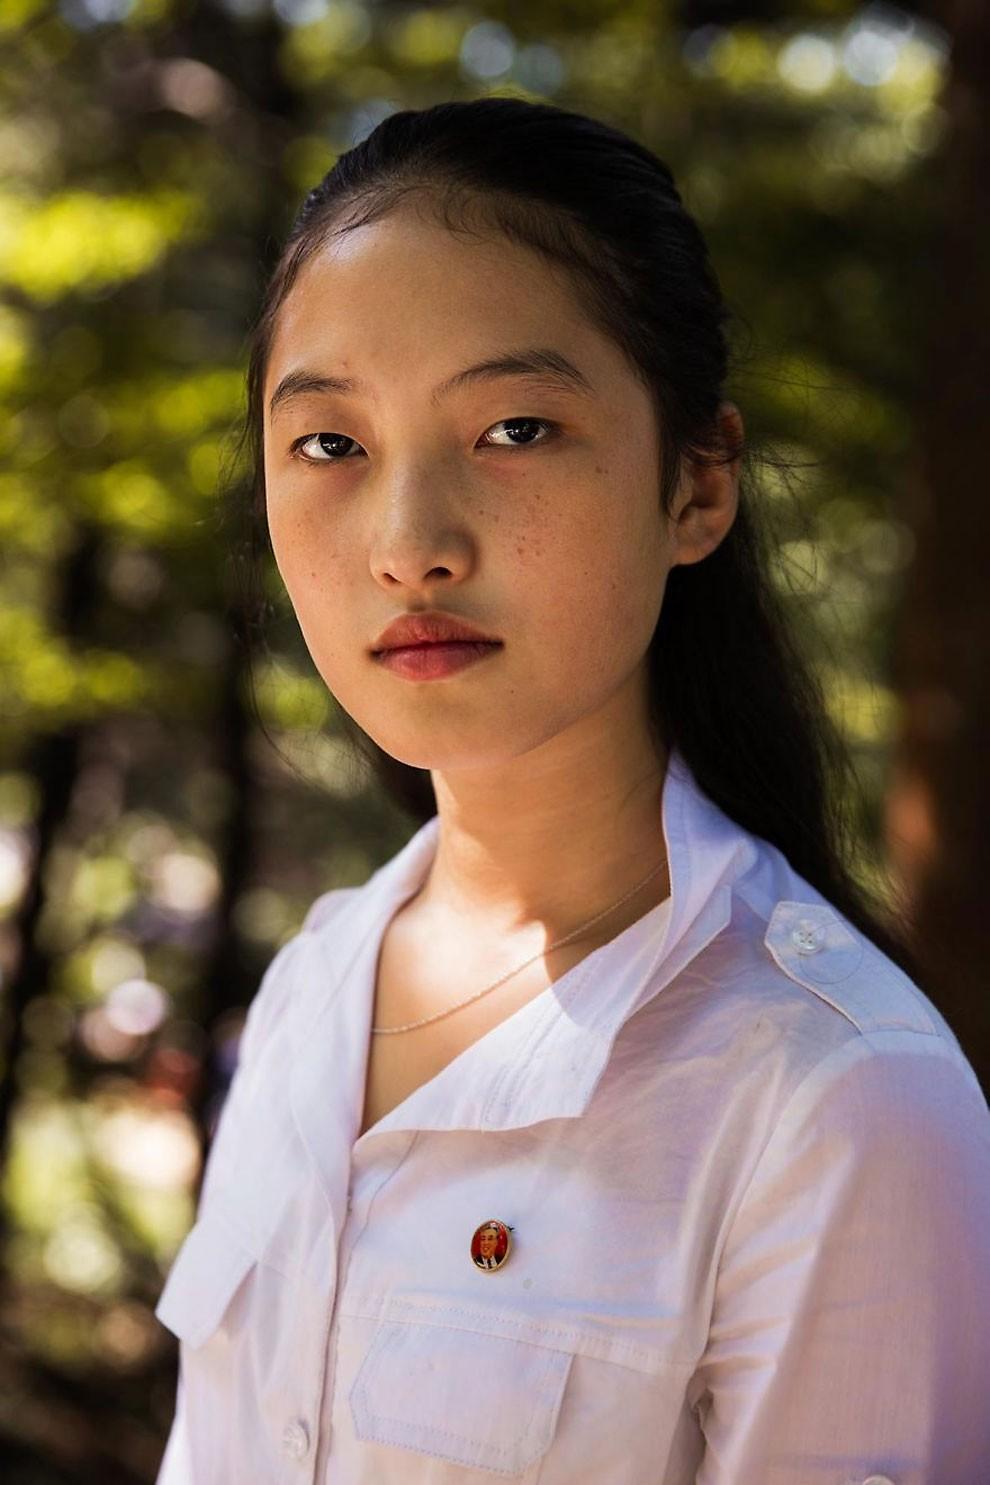 foto-donne-corea-atlas-of-beauty-mihaela-noroc-06